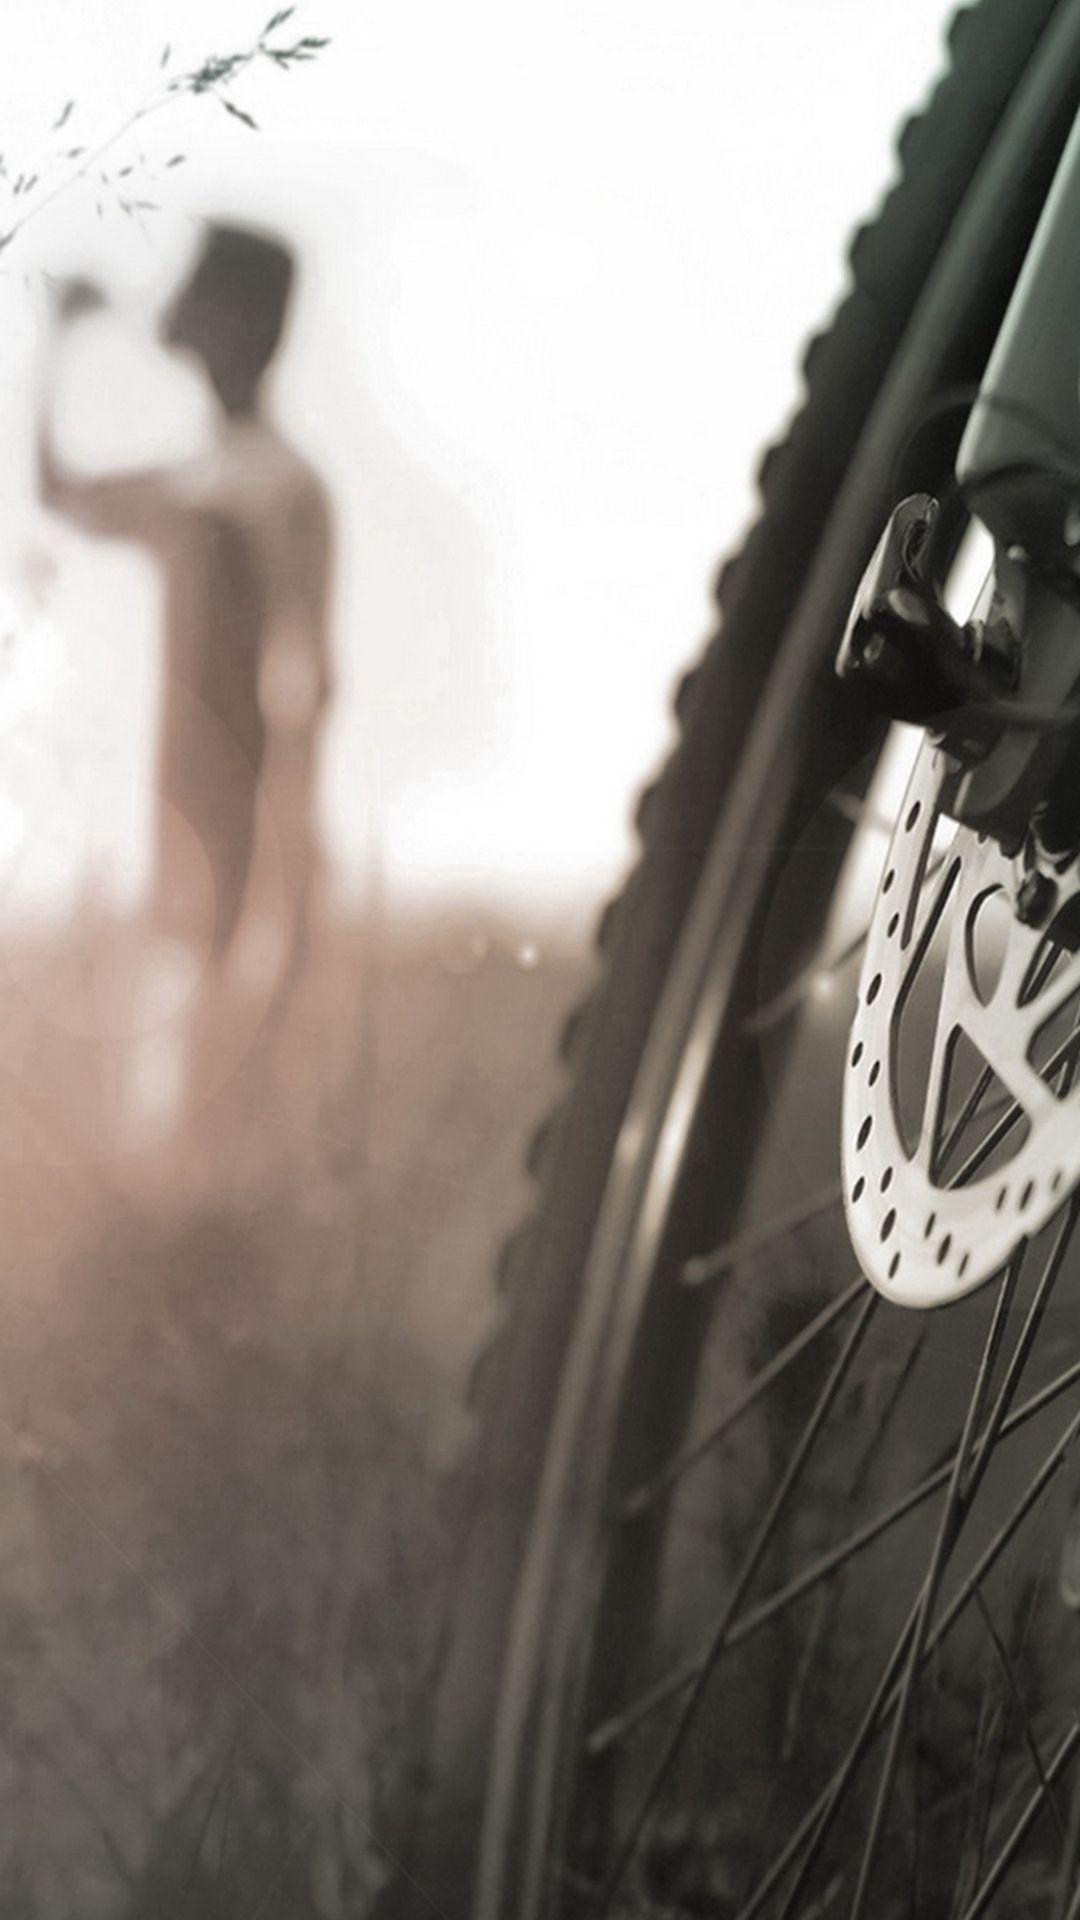 Macro Bike Wheel iPhone 6 wallpaper Bike wheel